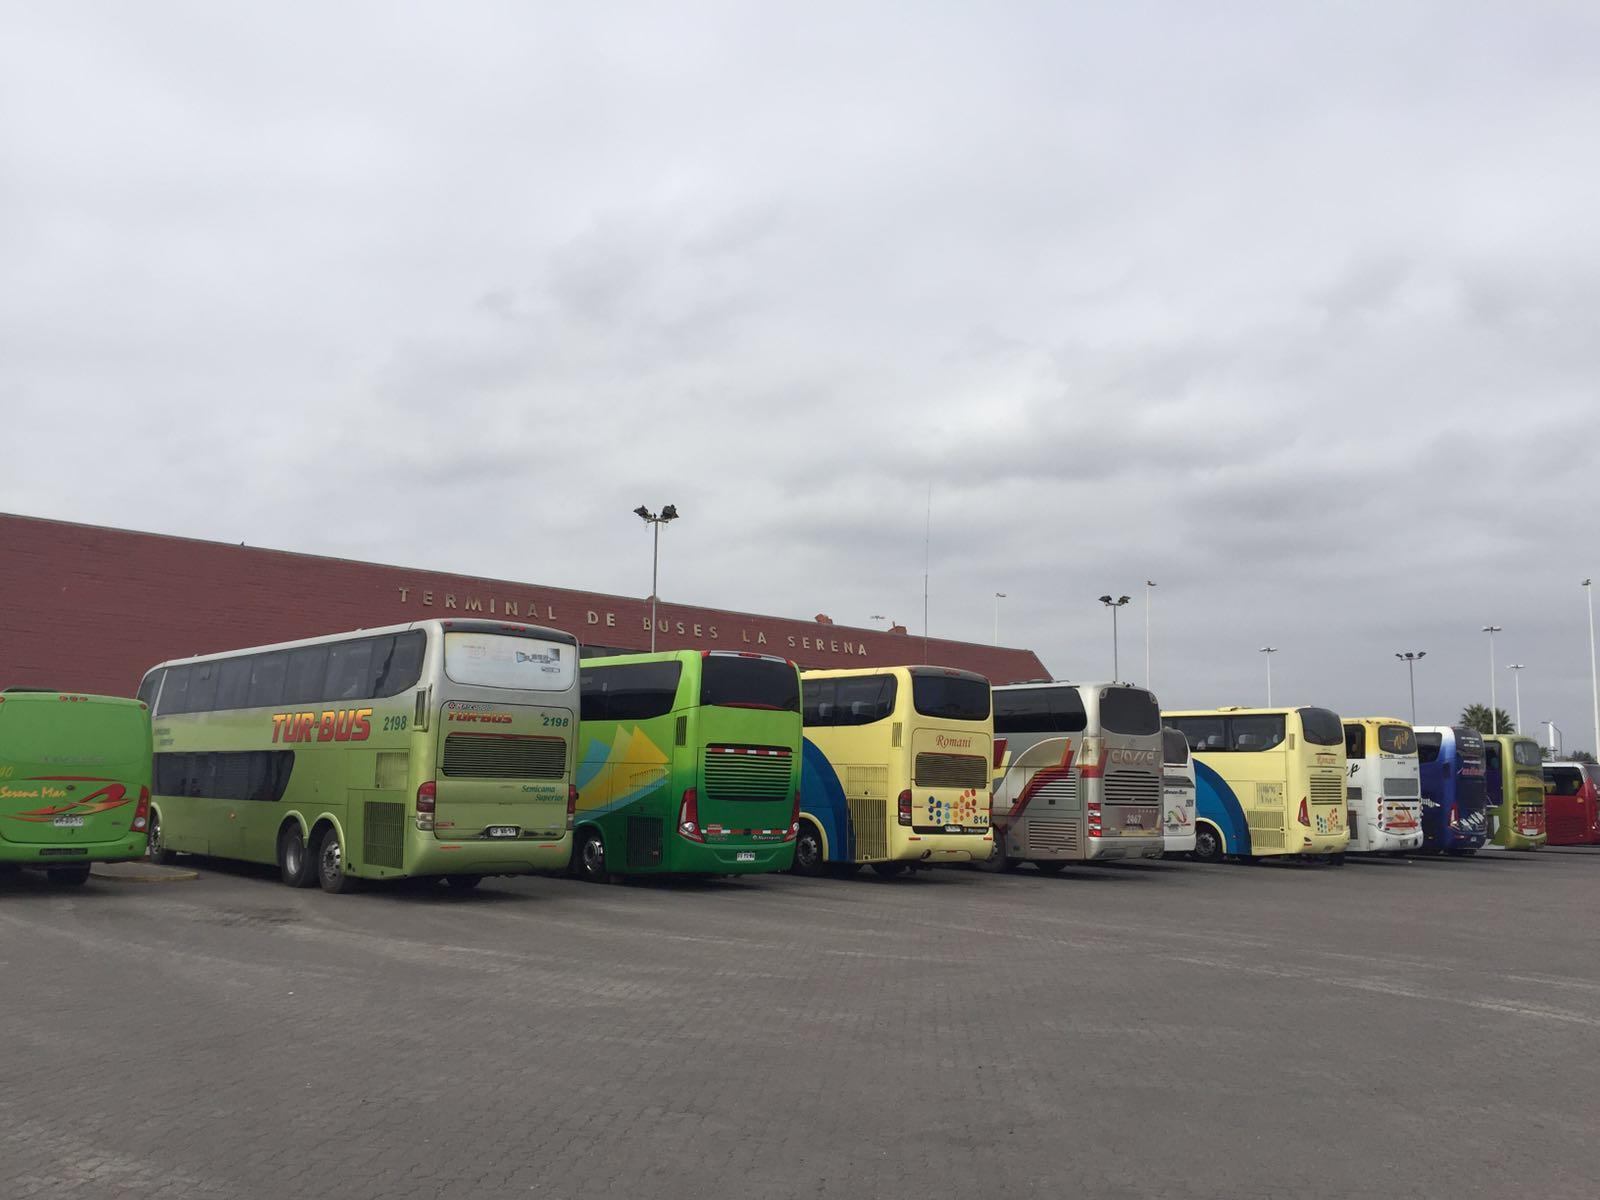 Terminal La Serena - 8